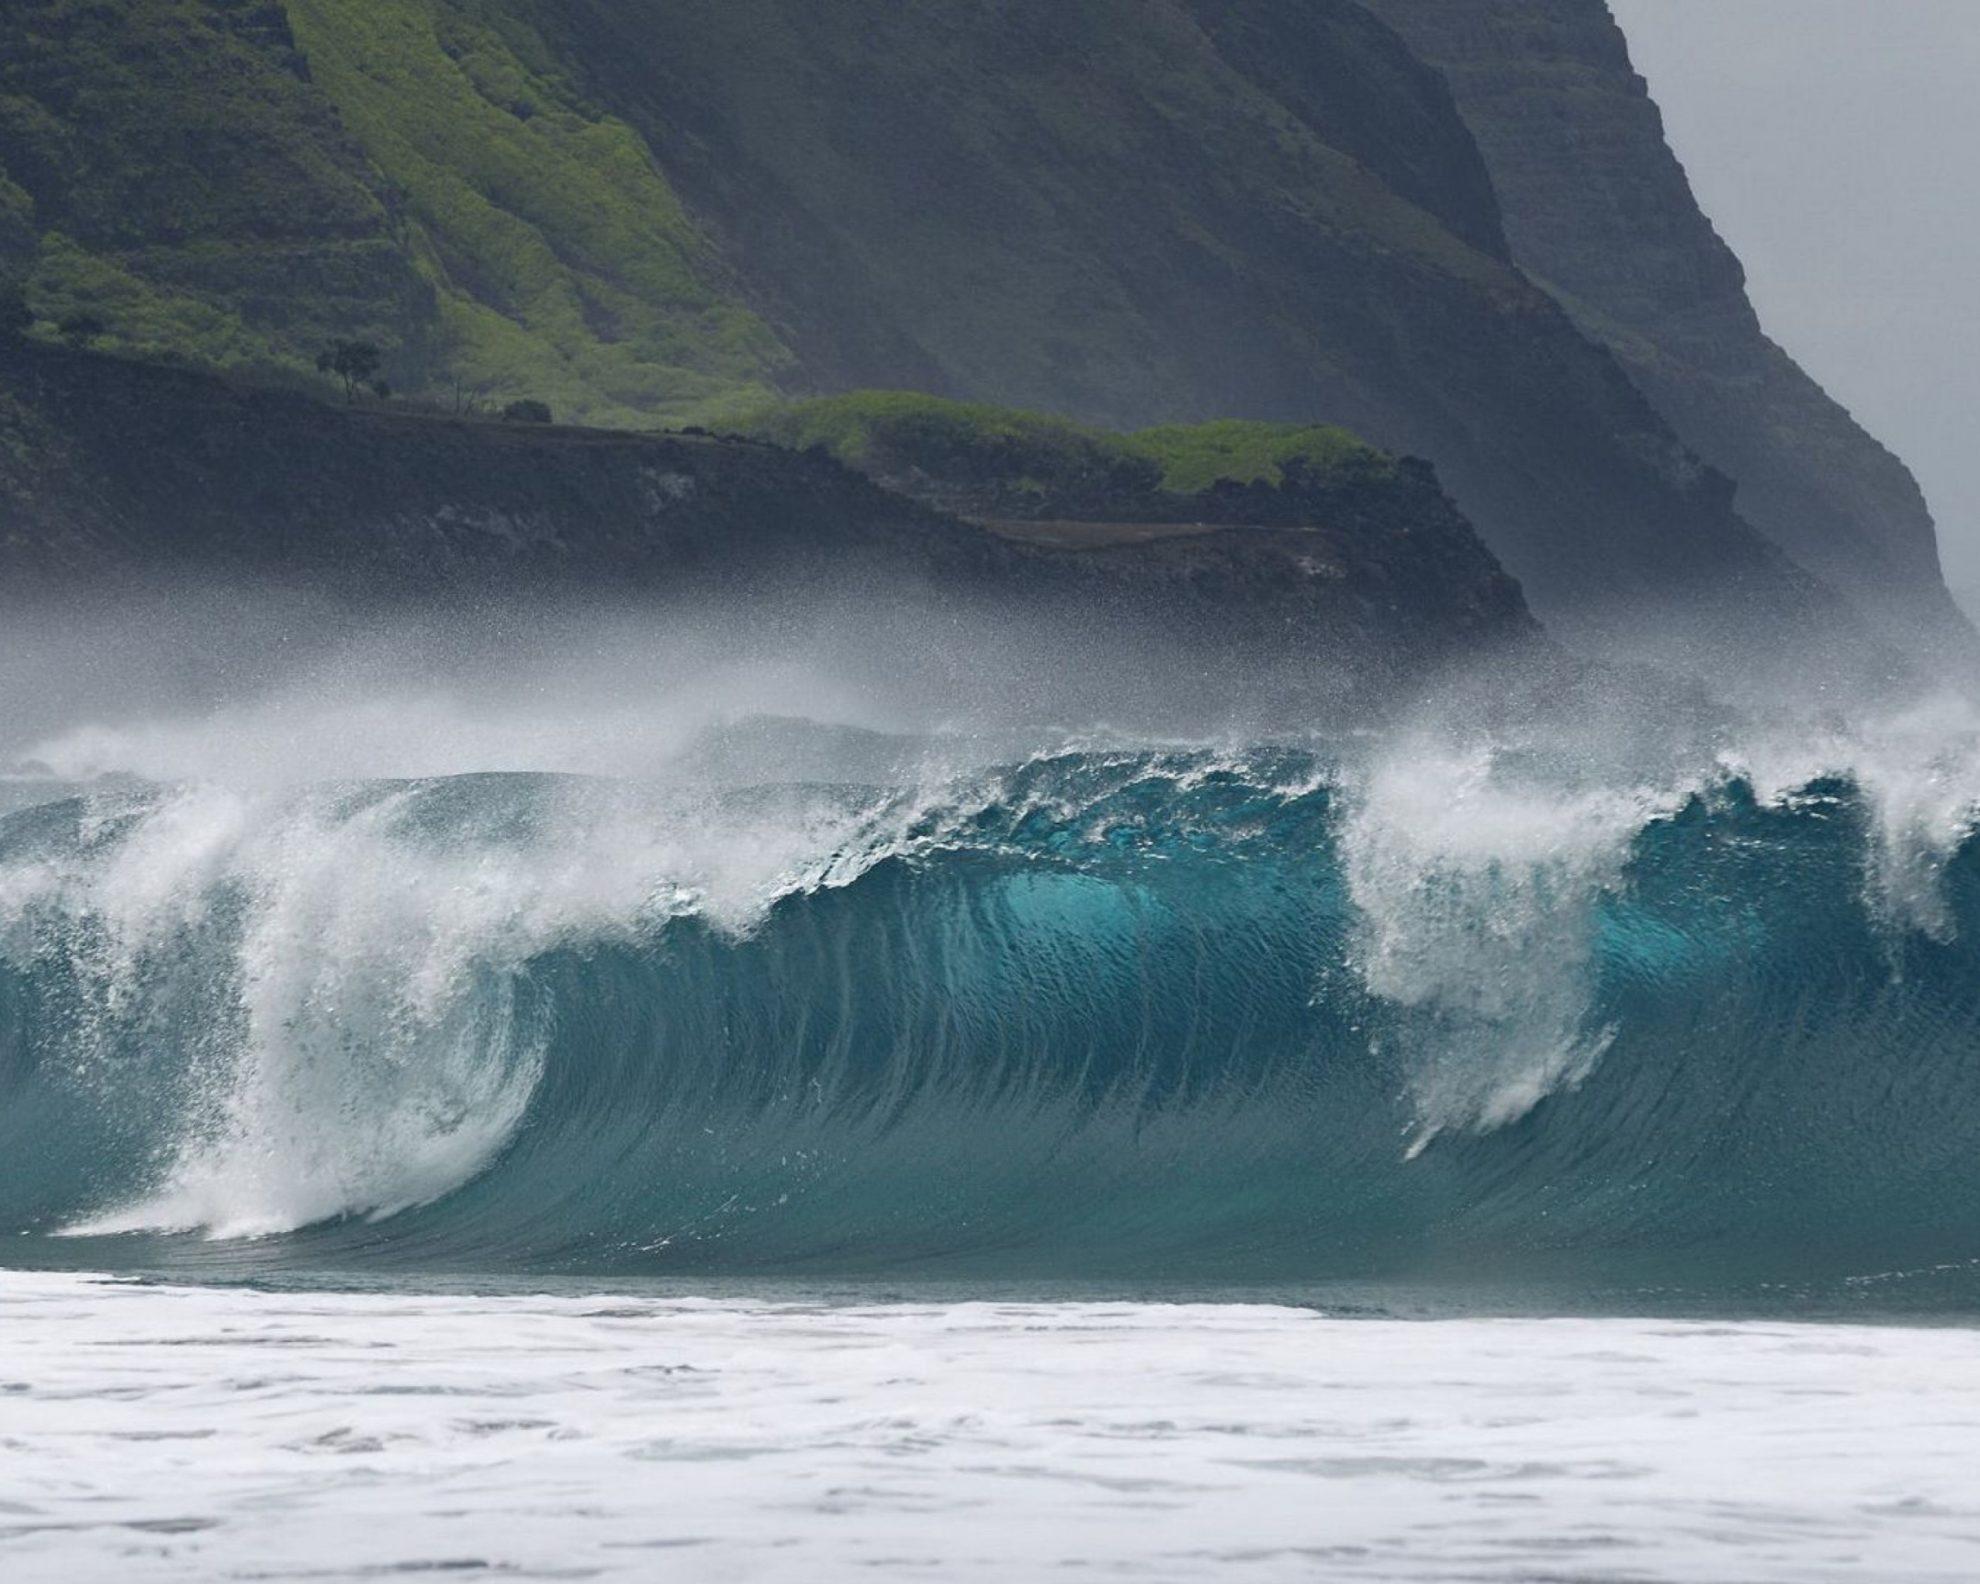 Kalaupapa-Leper-Colony-Beach-breaking-wave-Welle-2048x2560